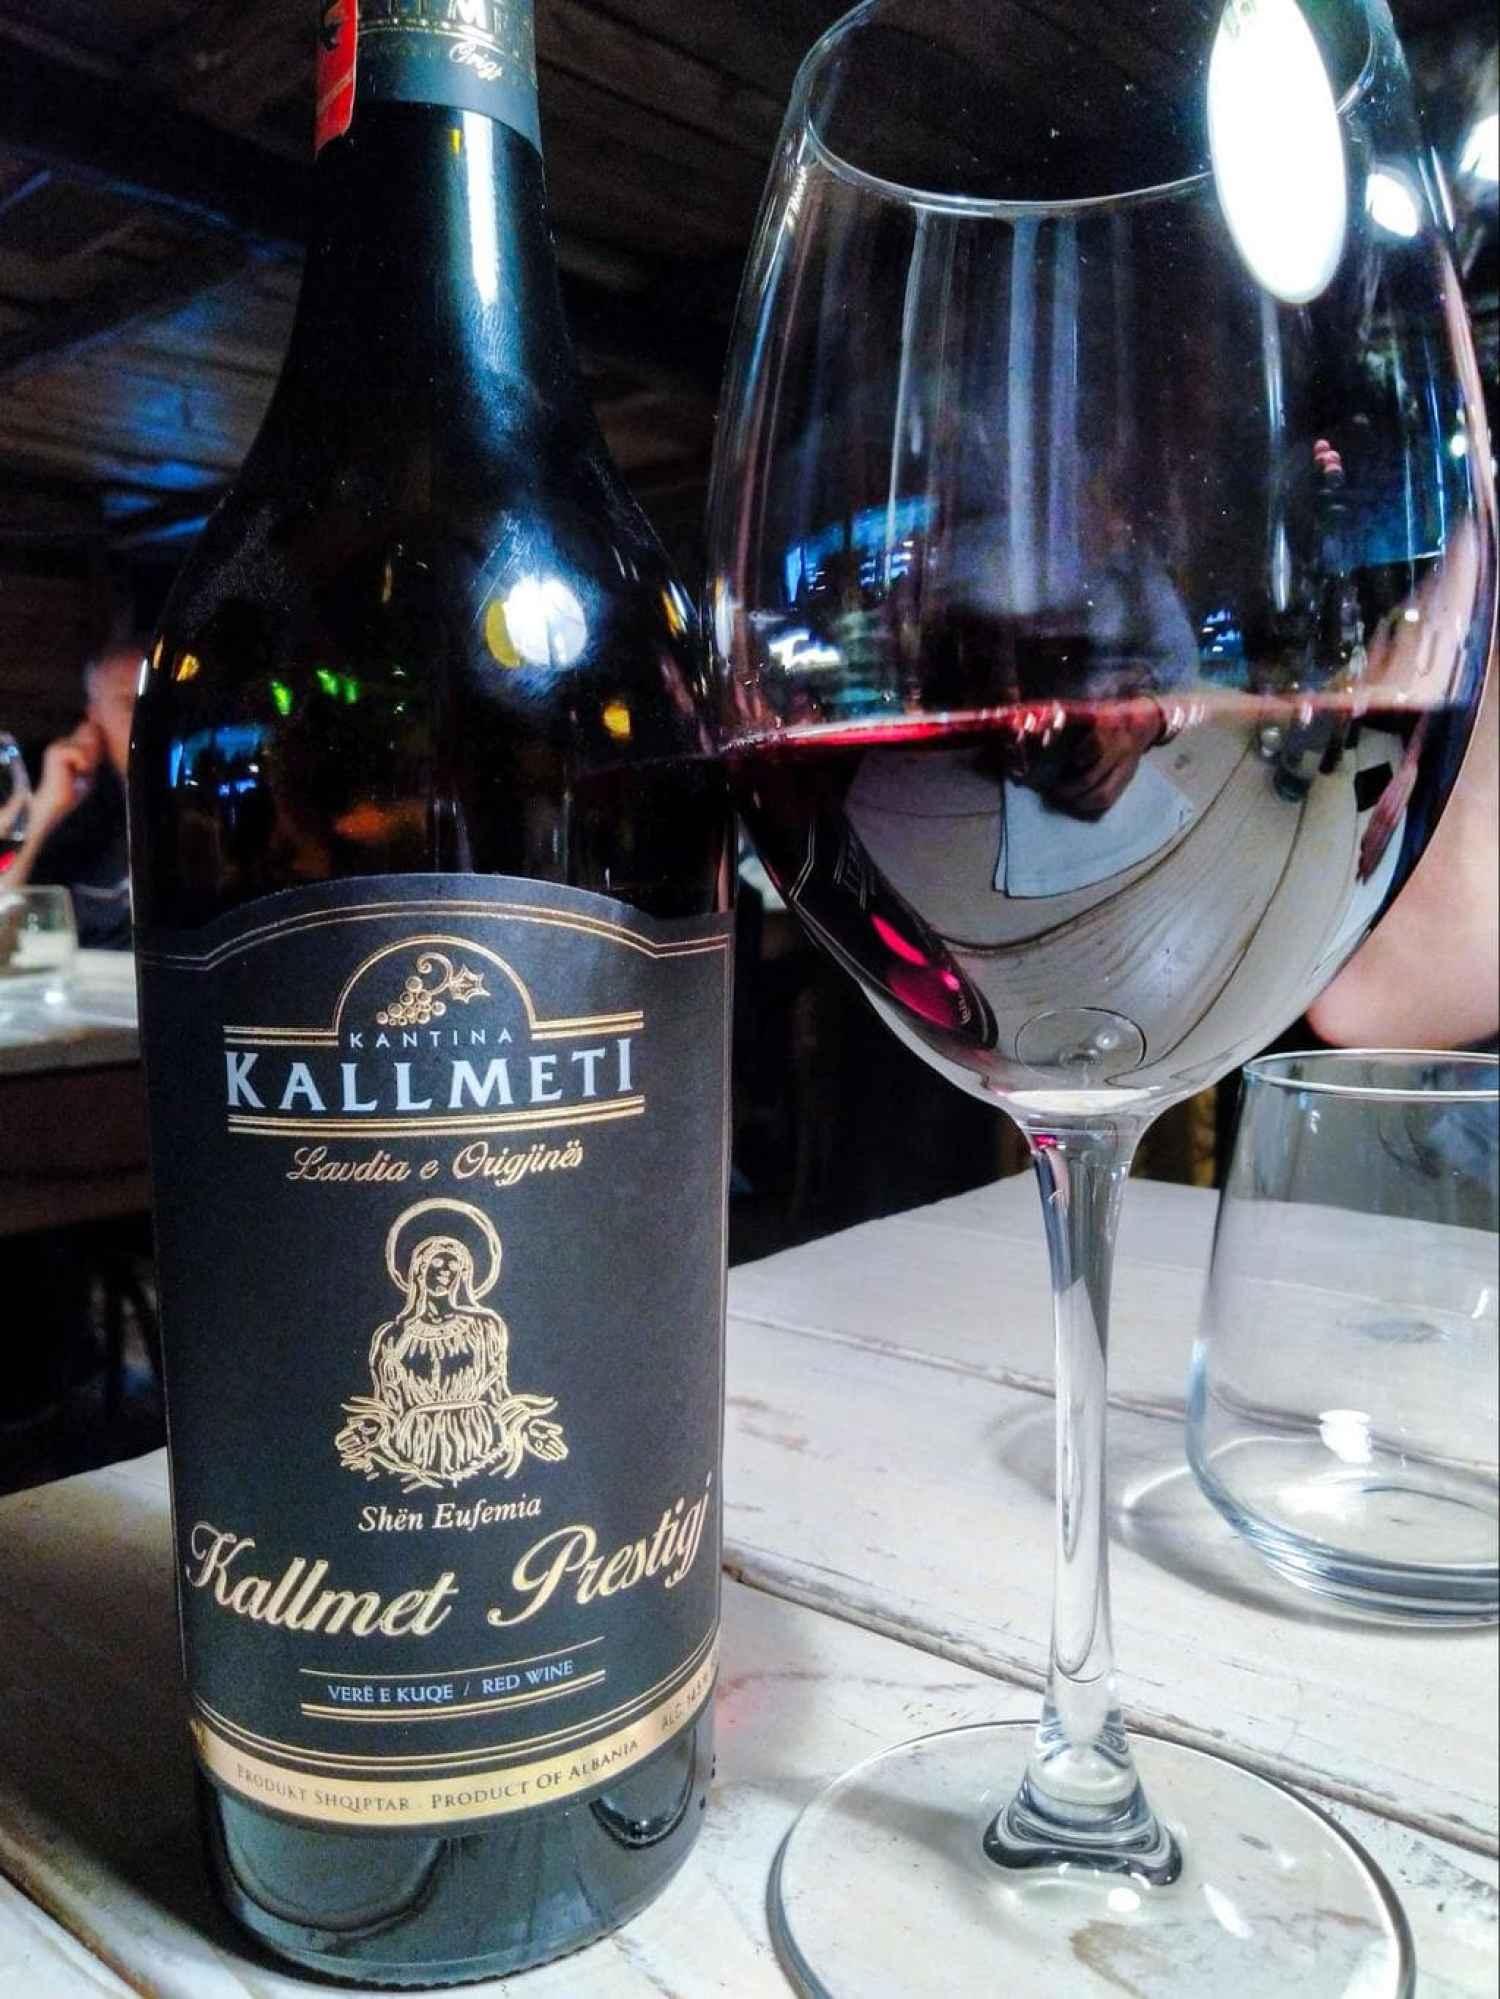 Kallmet Prestigi wine from Kallmeti